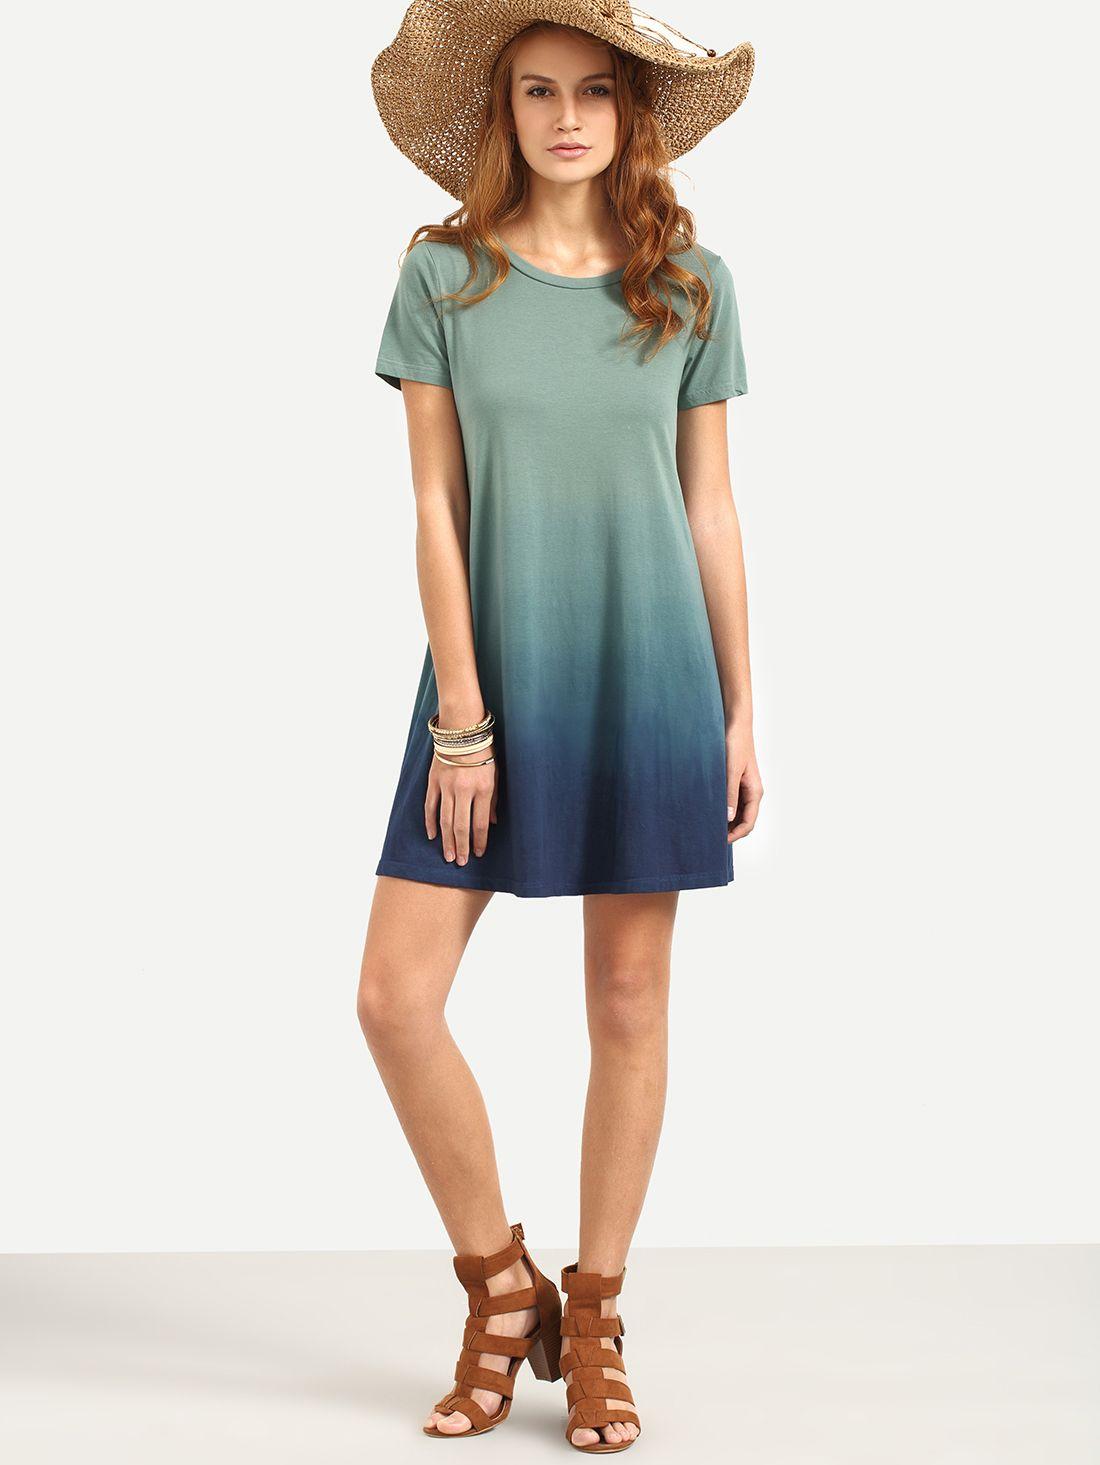 Shop multicolor short sleeve tshirt dress online shein offers